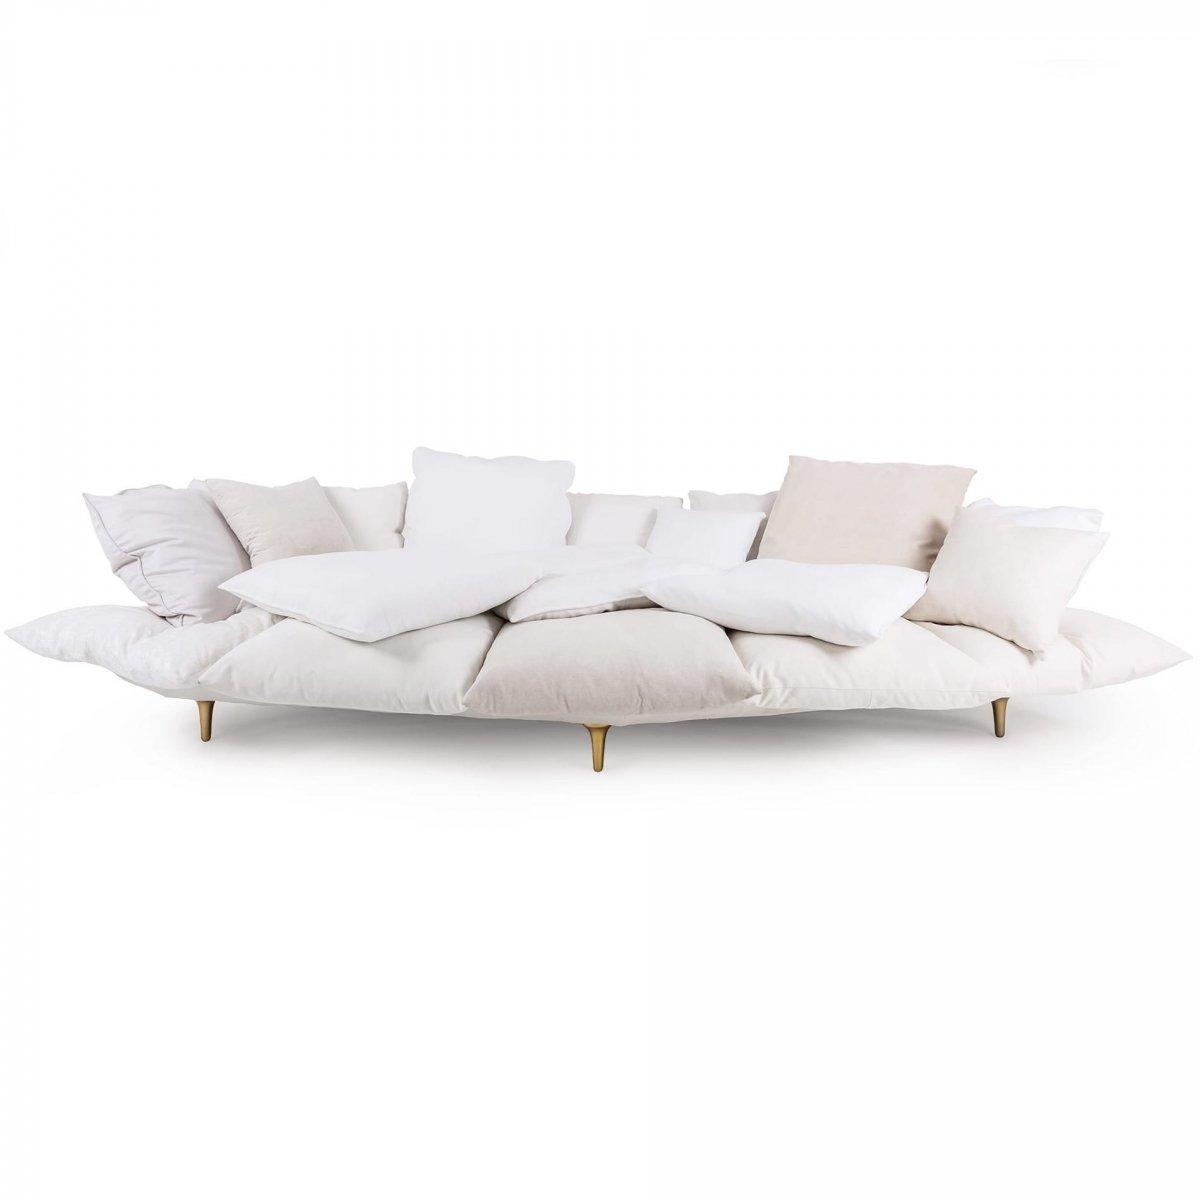 Диван Seletti Sofa Comfy White  - фото 1